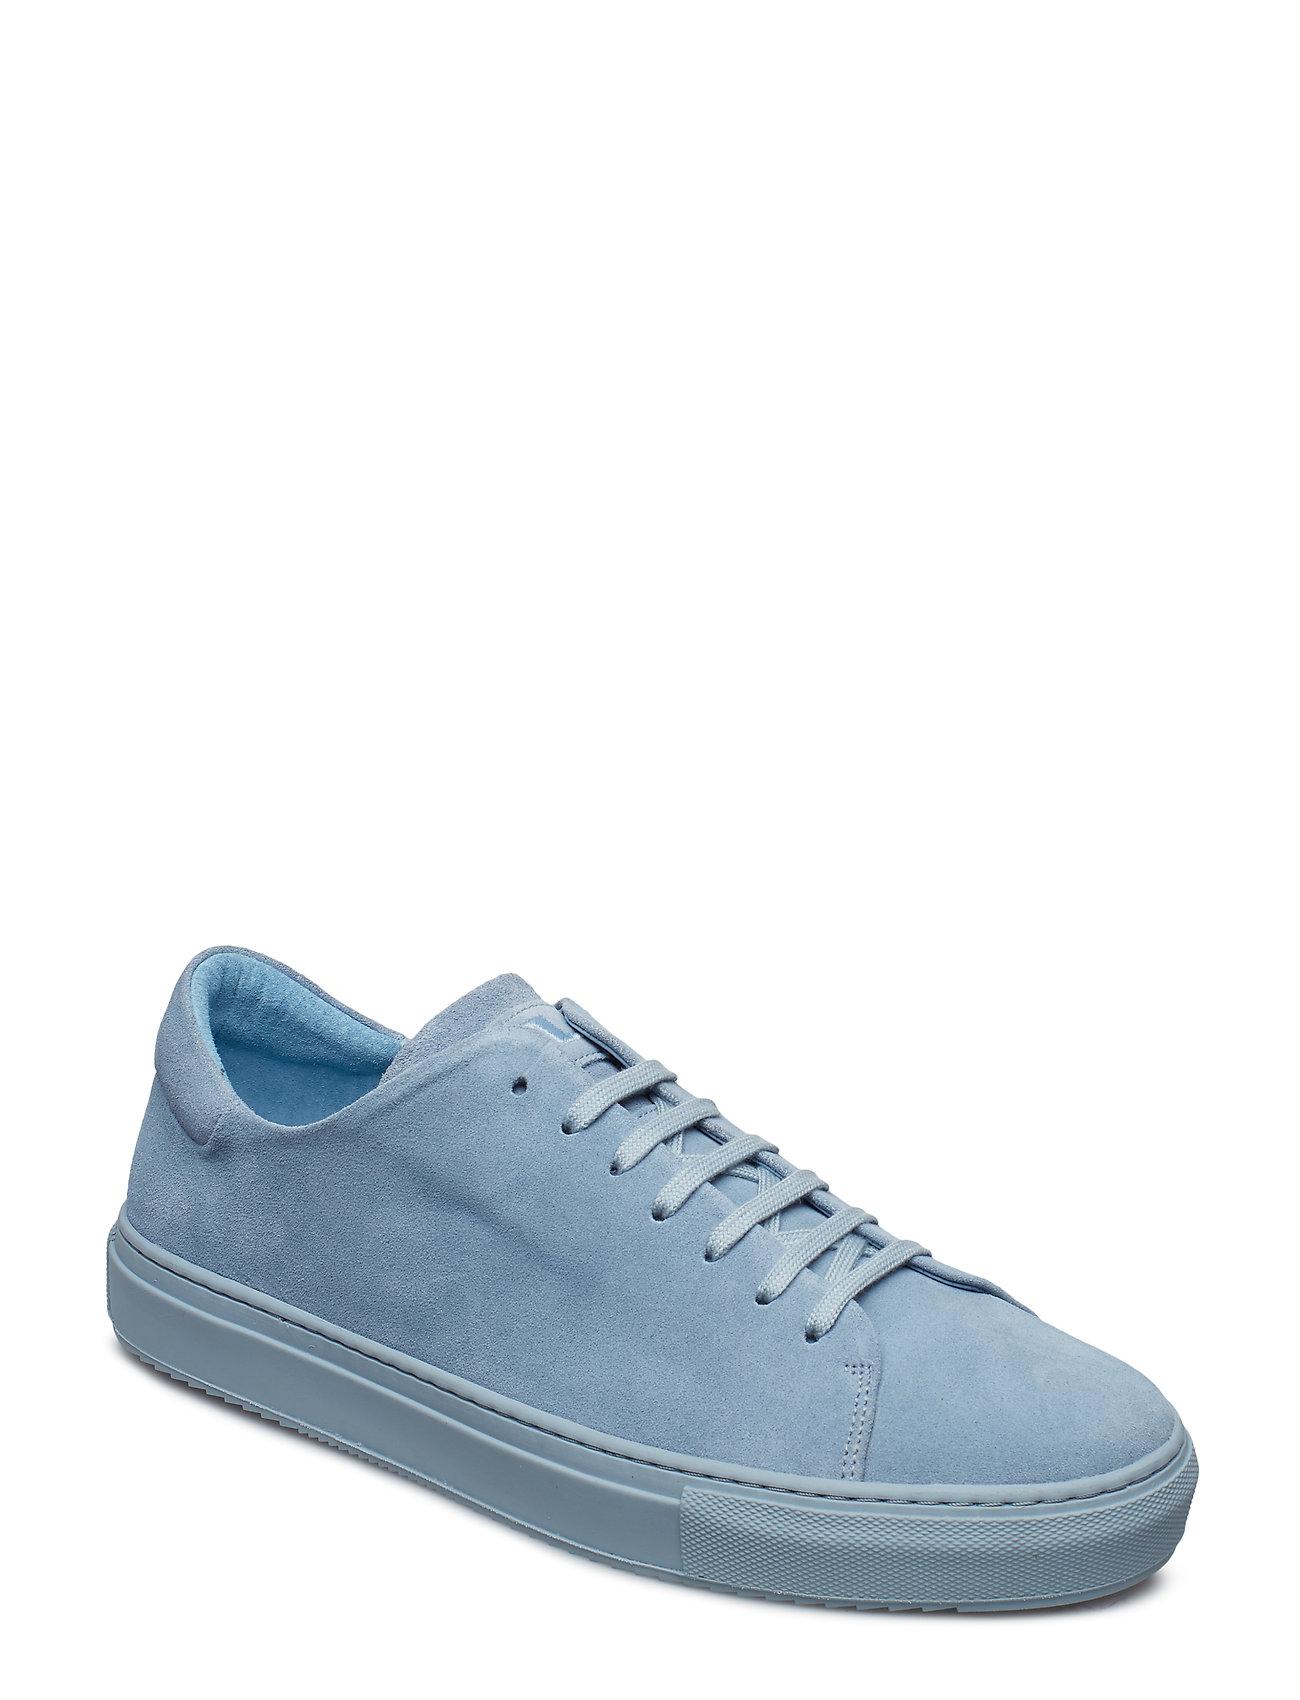 premium selection 44bde a4ee2 Sneaker Lt Block Suede